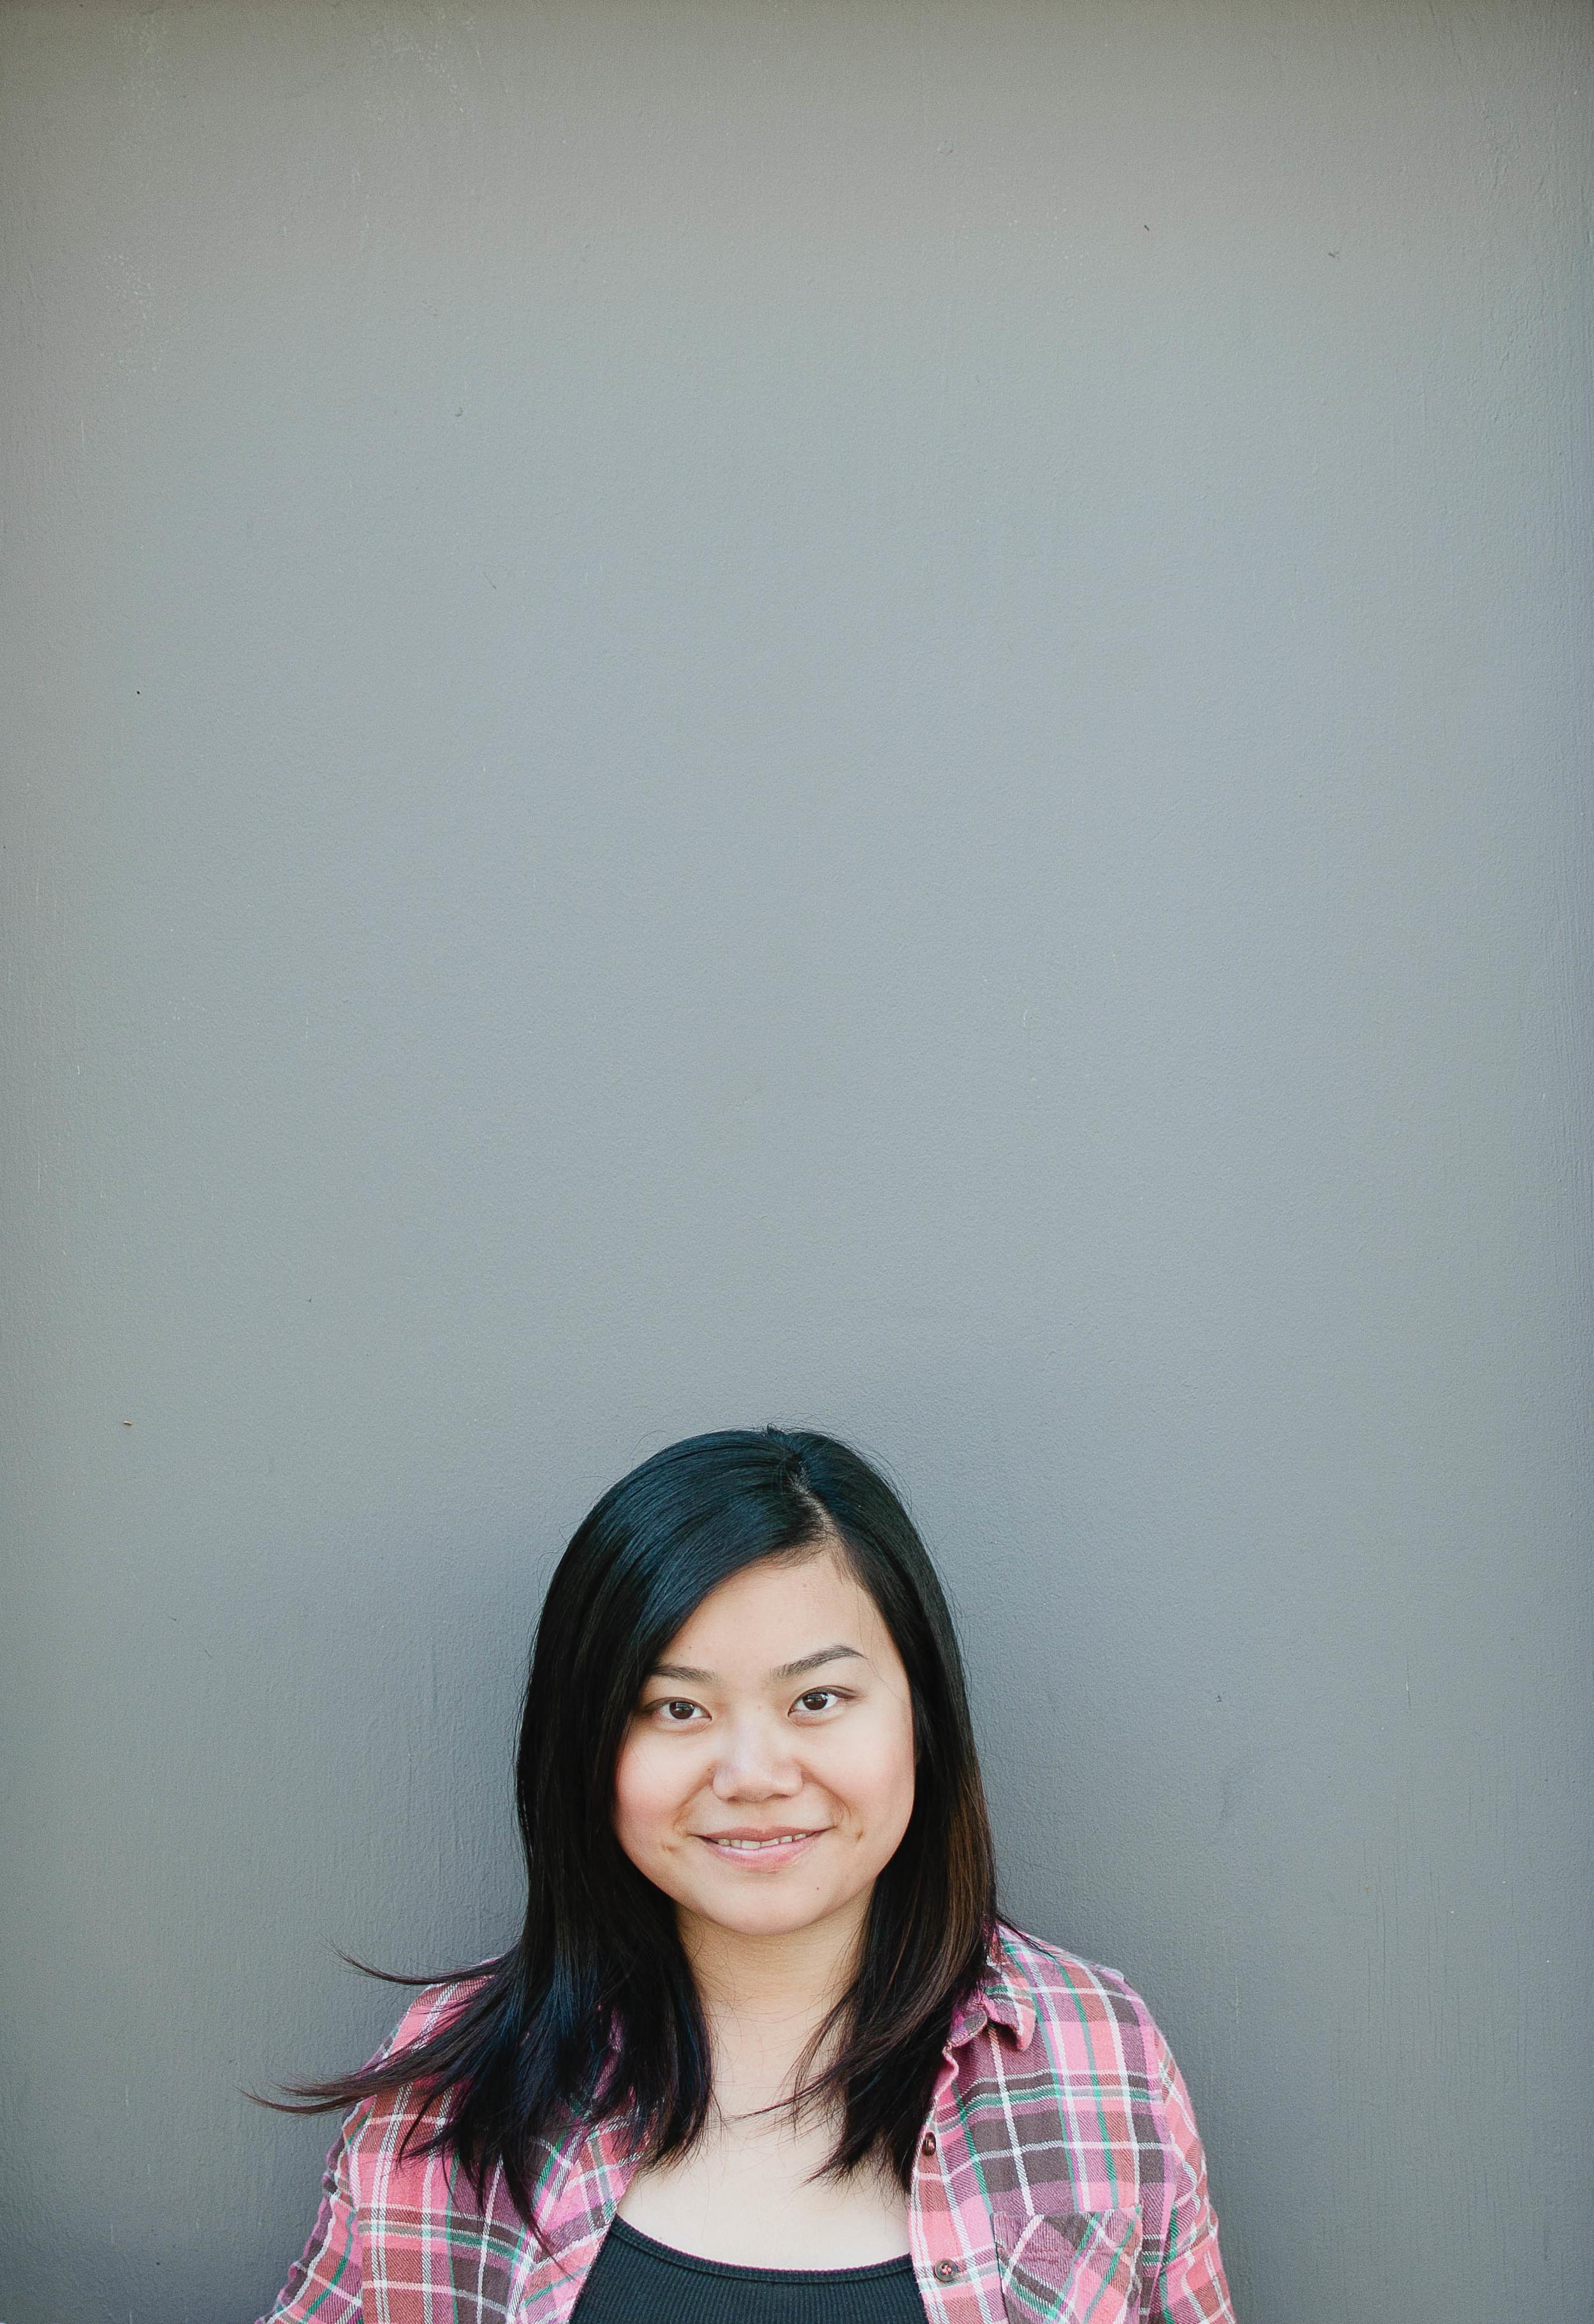 Melissa-Katie Powell Photography - Olympic Village-Portraits-Vancouver-5.jpg